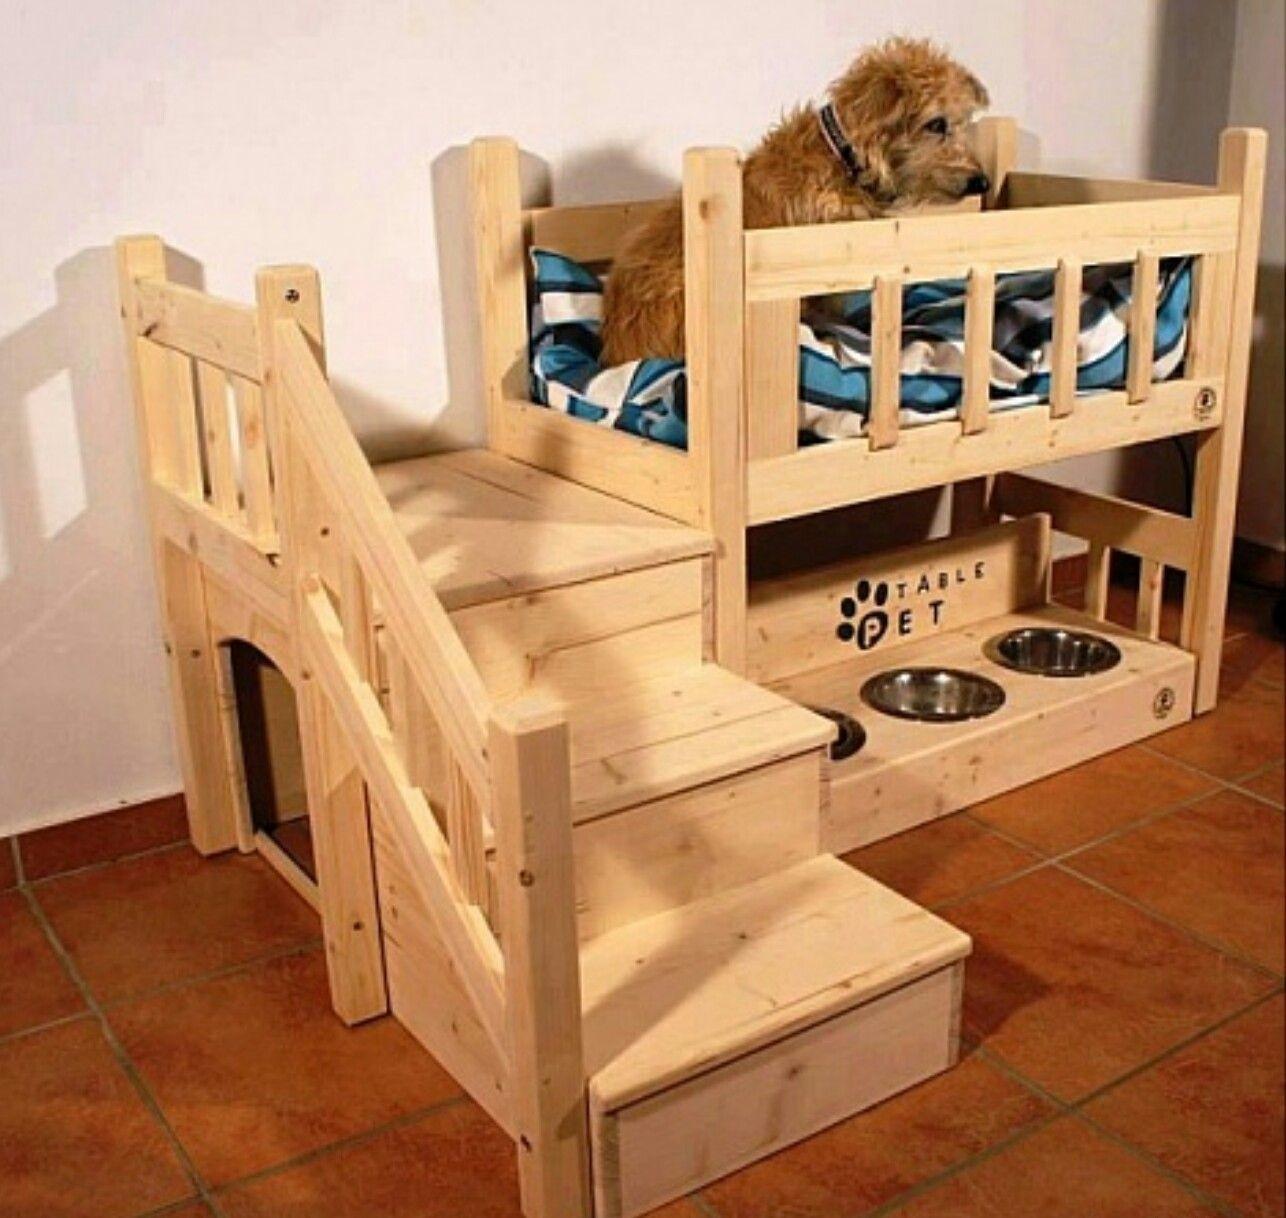 Dog bedroom furniture Luxury Dog Bed Nightstand With Steps Foter Dog House Furniture Ideas On Foter